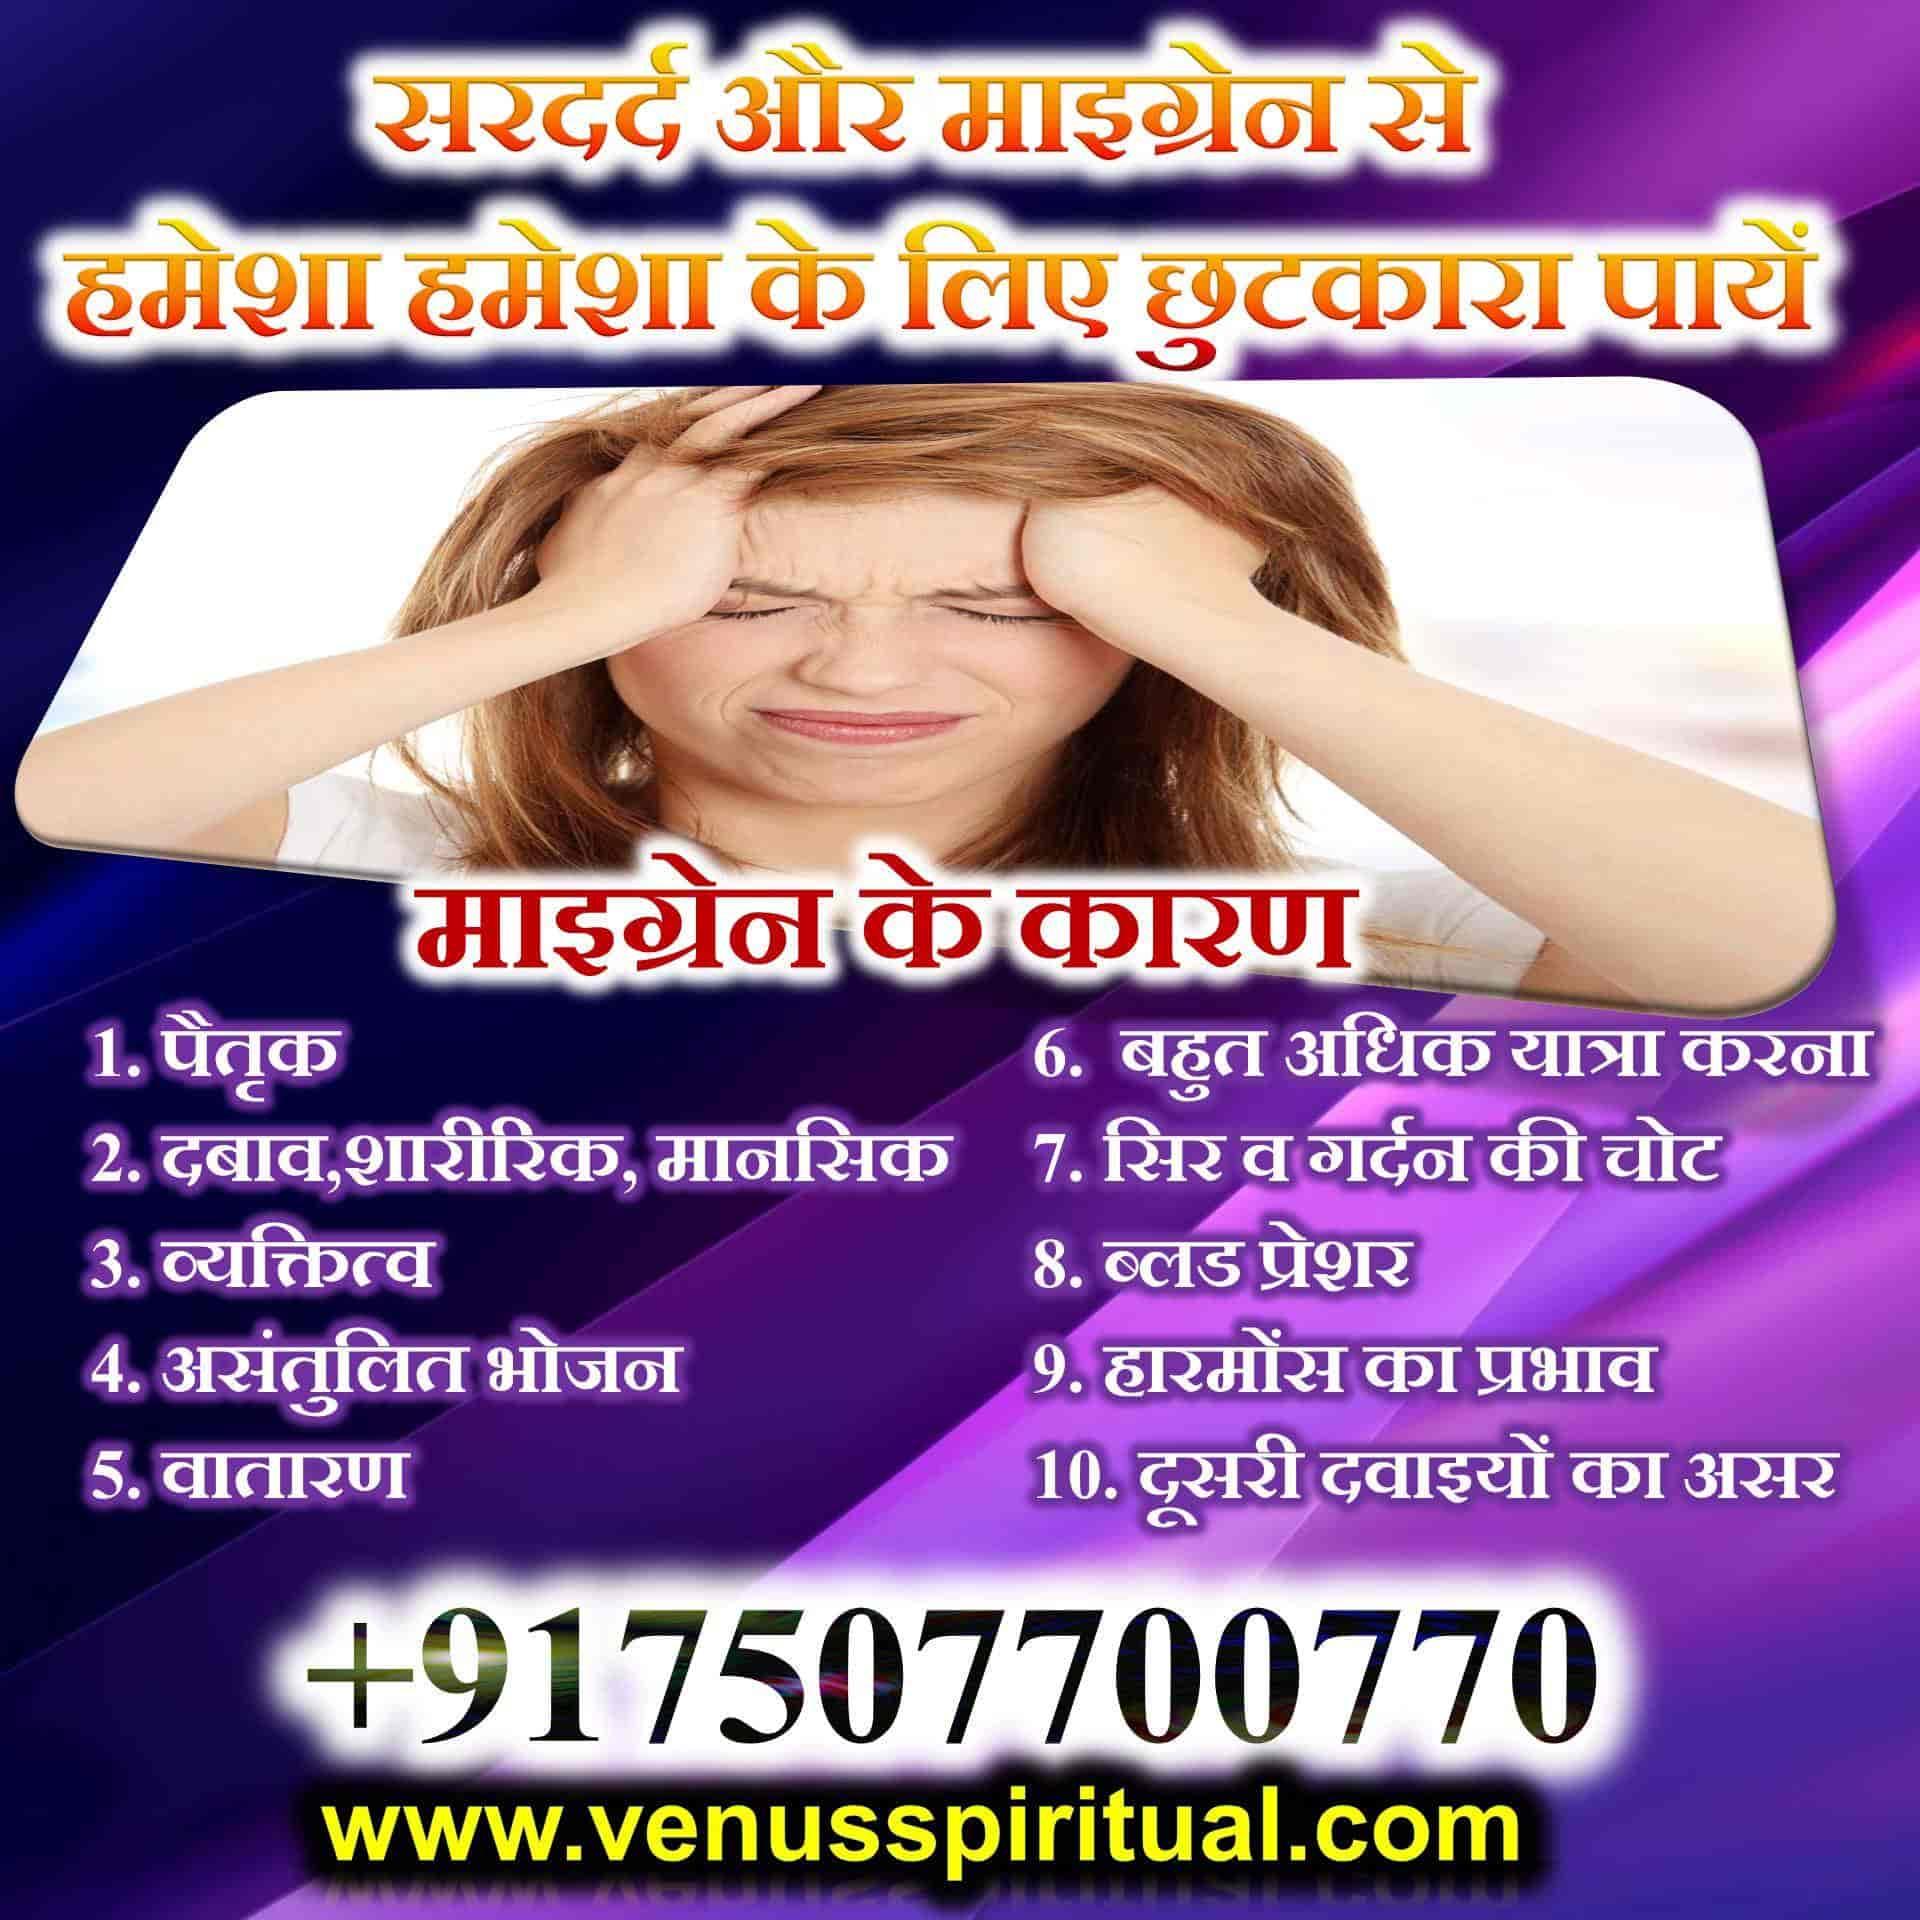 Venus Spiritual Healing Community, Vishrantwadi - Reiki